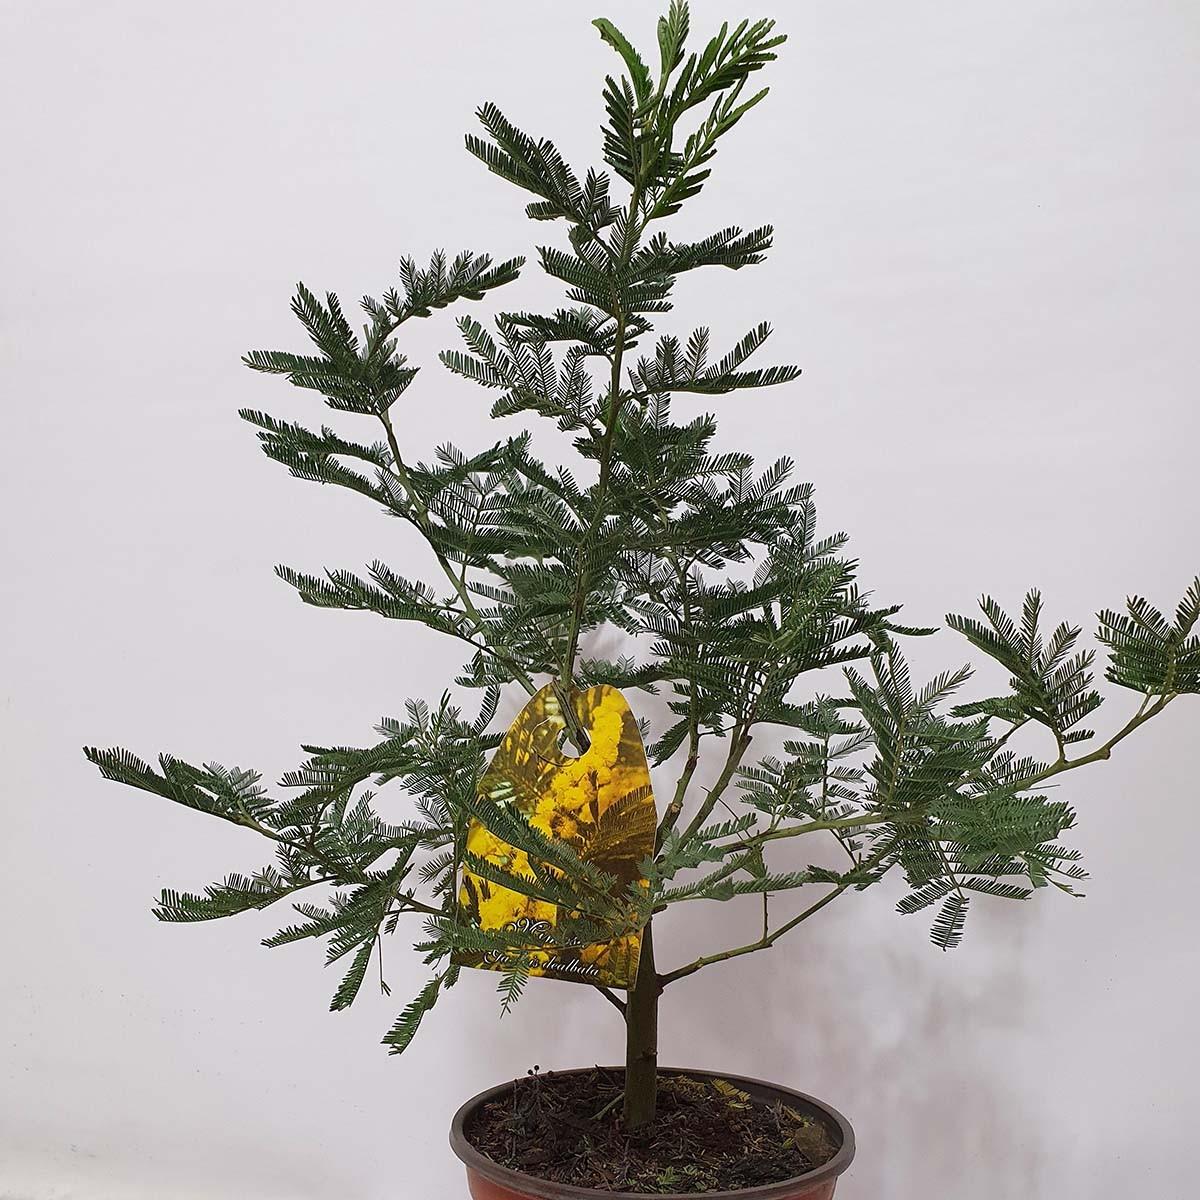 Цветок Мемоза 40-50 см. в горшке